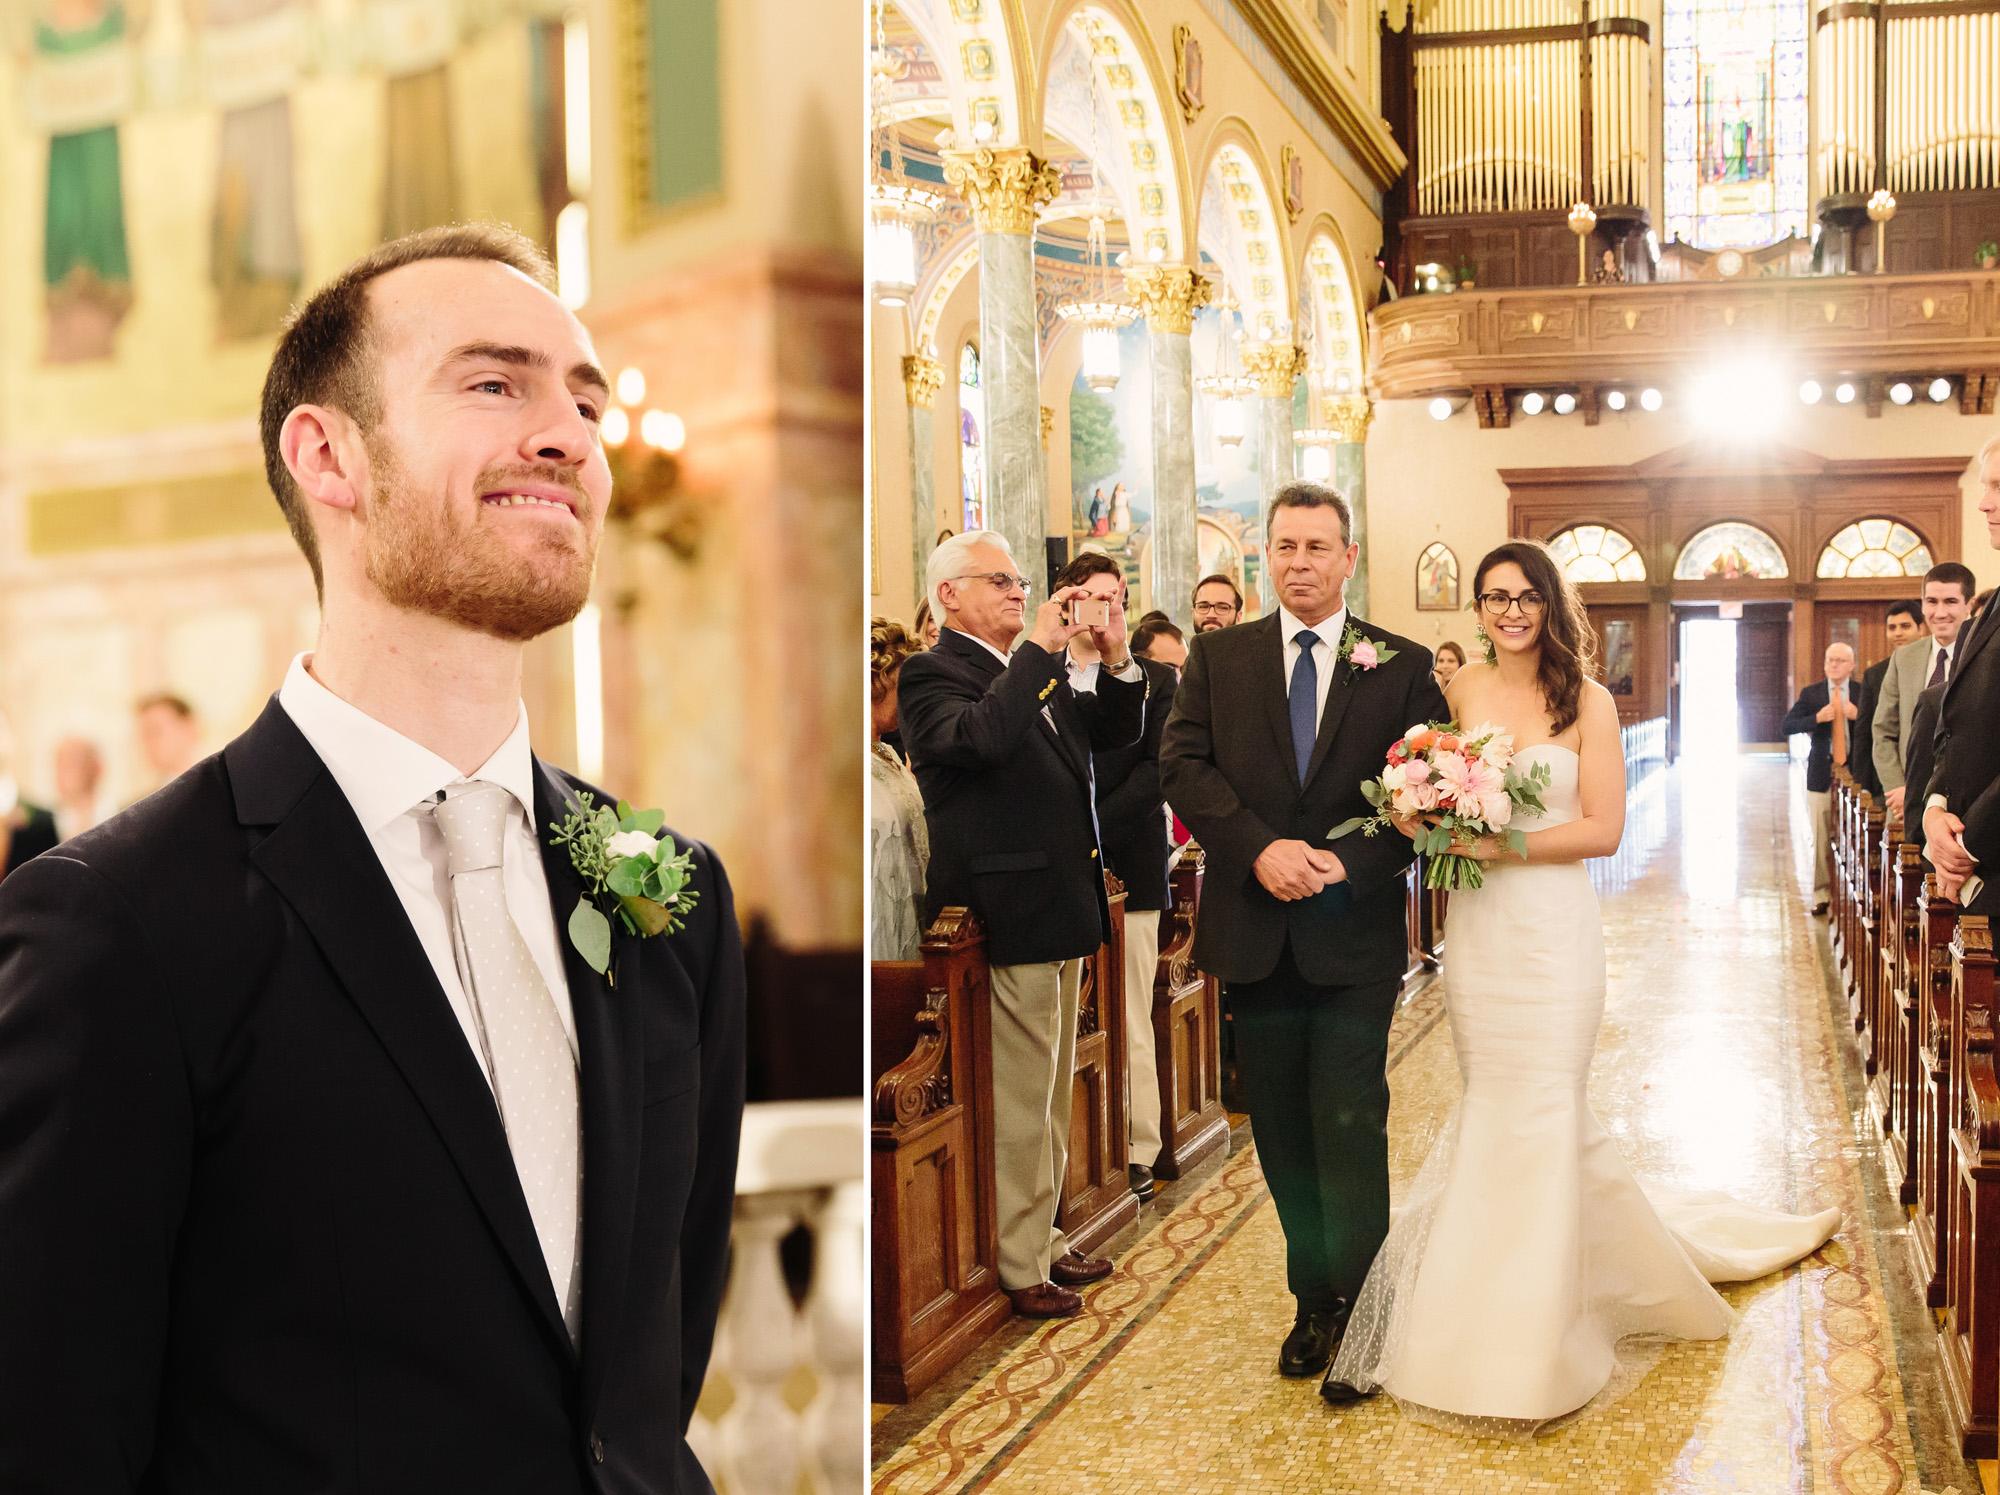 19_Kate_Sam_Picnic_House_Wedding_Brooklyn_NY_Tanya_Salazar_Photography.jpg